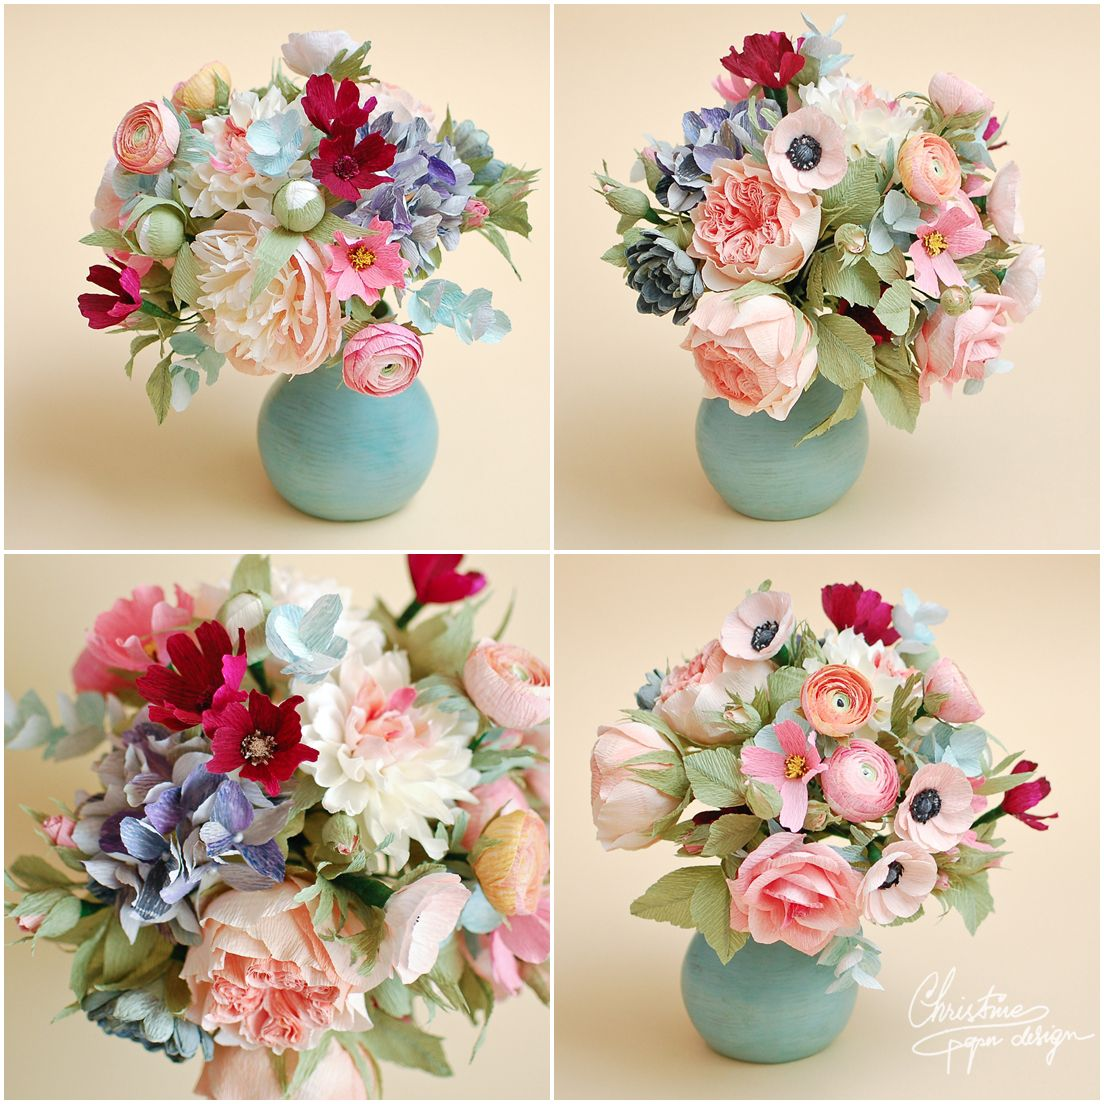 3christine Paper Design Paper Flowers Centerpiece2 Flower Making